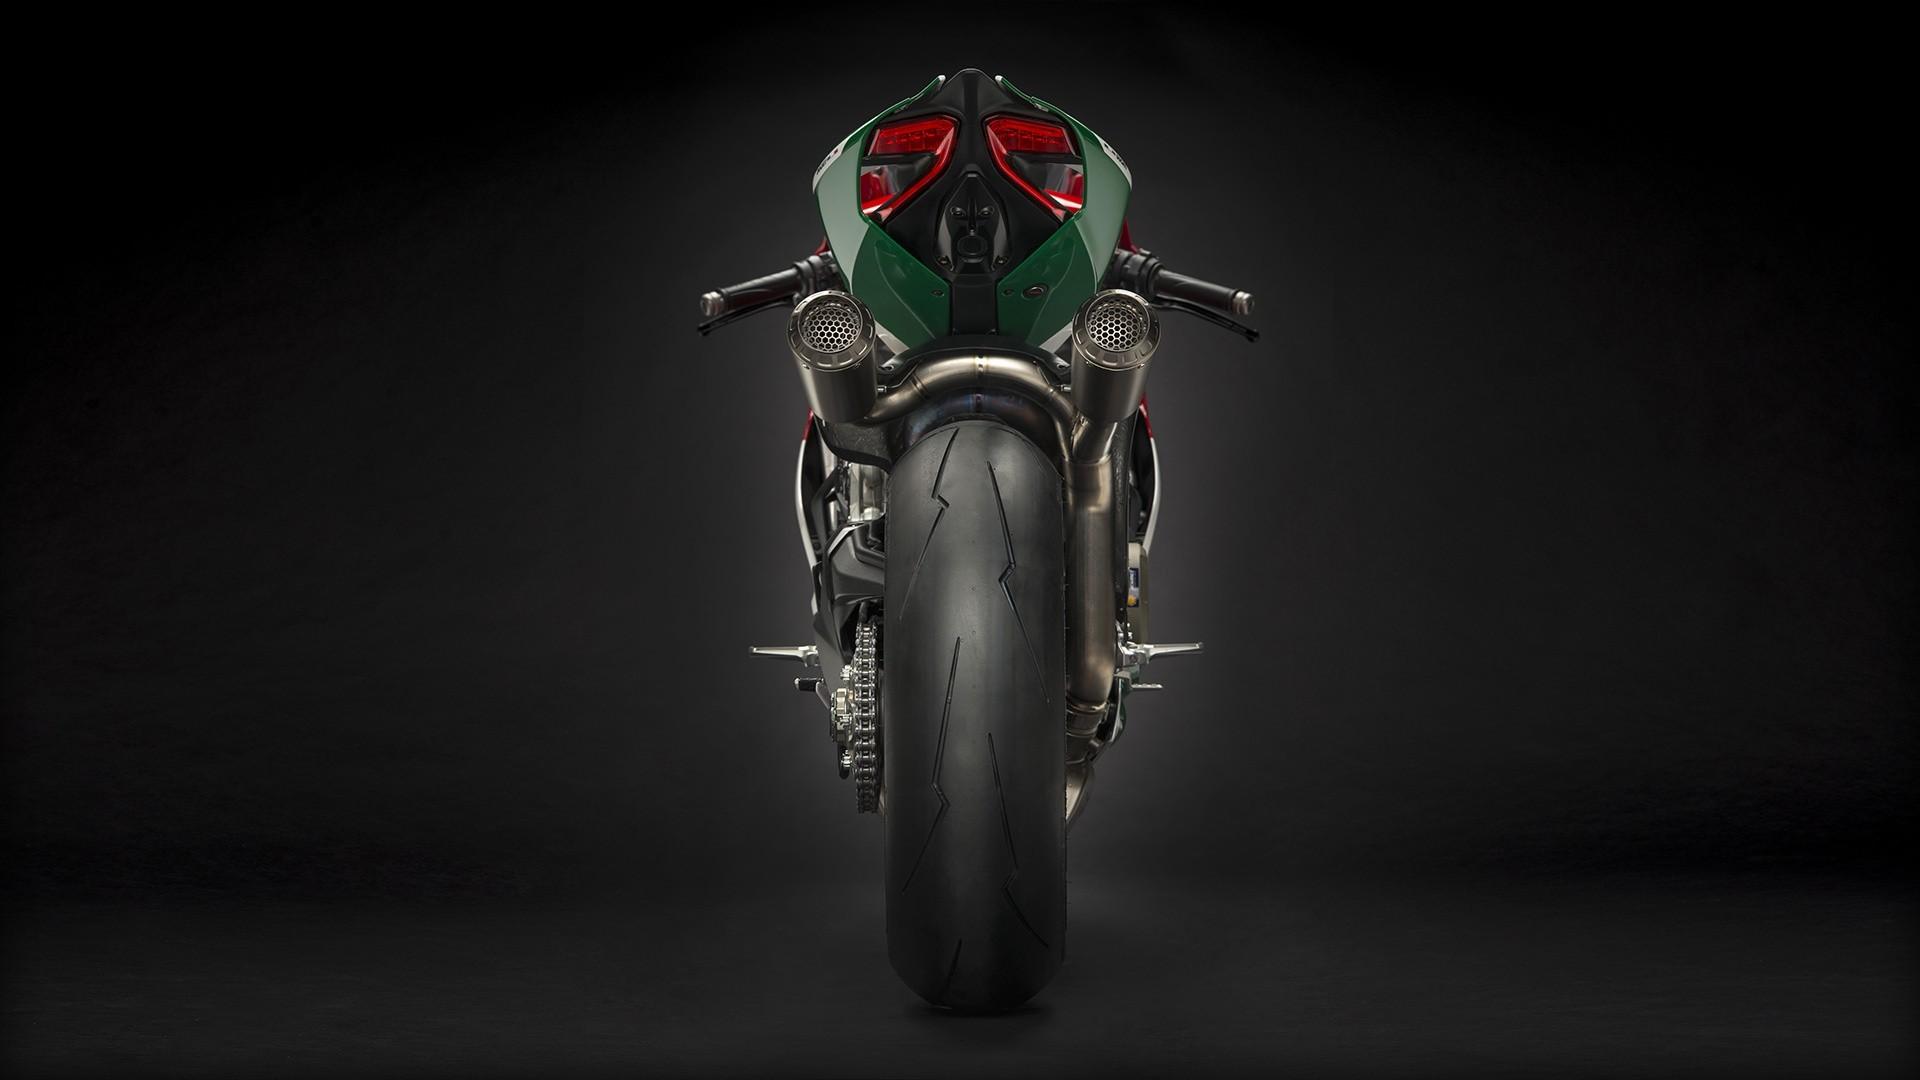 МОТОЦИКЛ DUCATI SUPERBIKE 1299 R FINAL EDITION ― Артмото - купить квадроцикл в украине и харькове, мотоцикл, снегоход, скутер, мопед, электромобиль